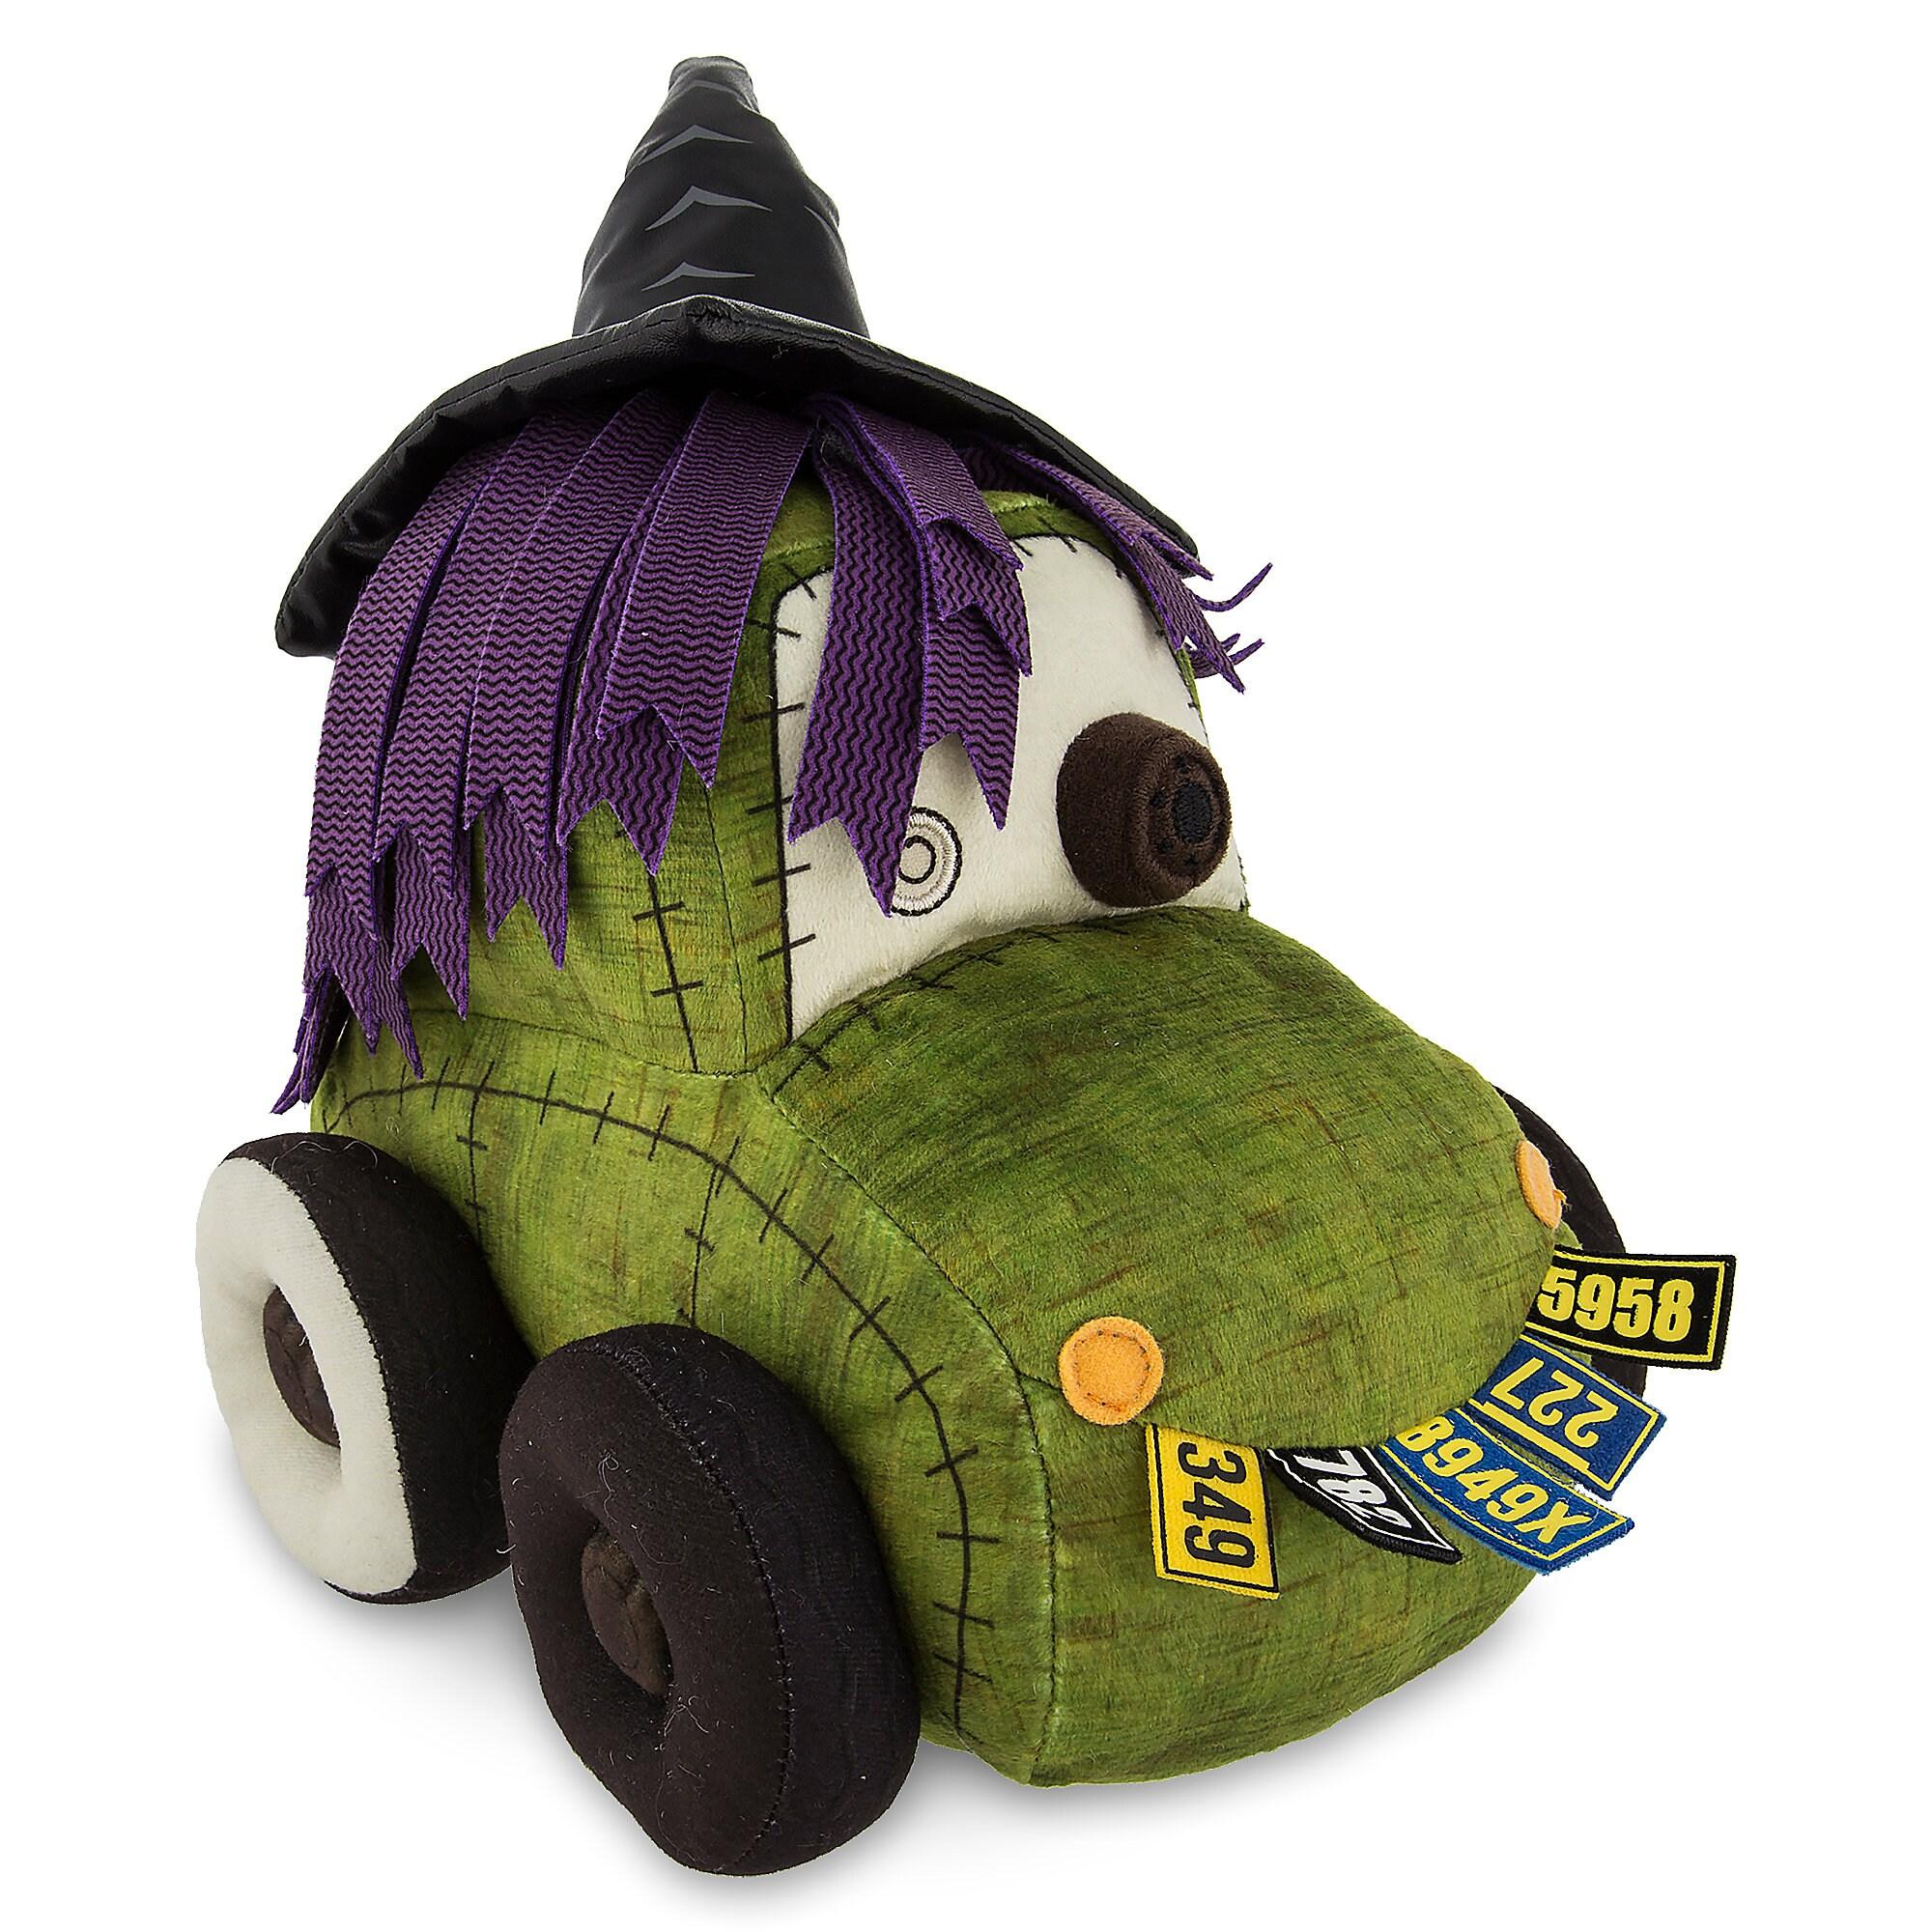 Scary Scarecar Halloween Plush - Cars Land